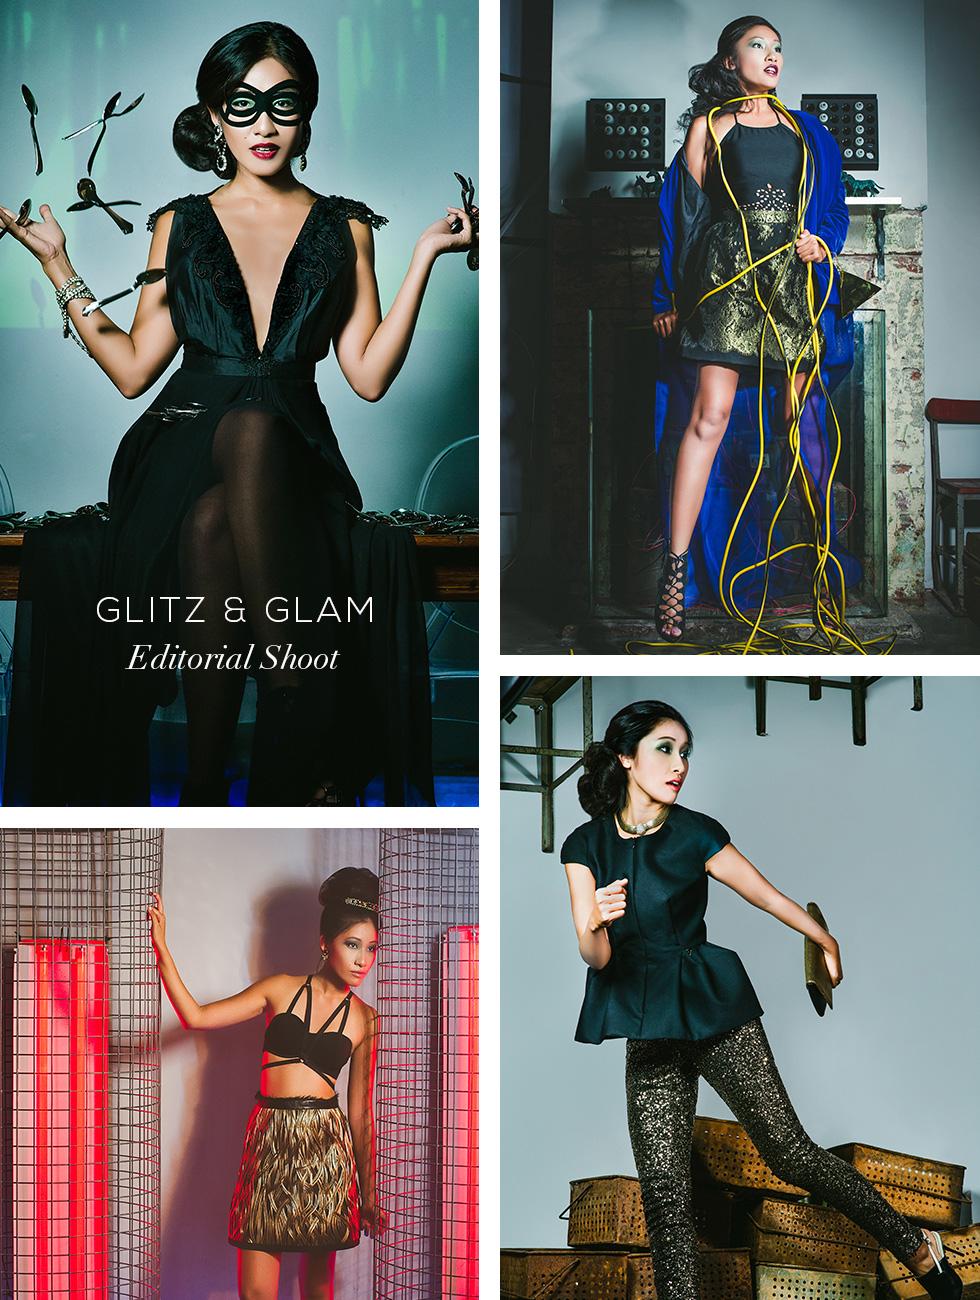 KWOO_GLITZ&GLAM